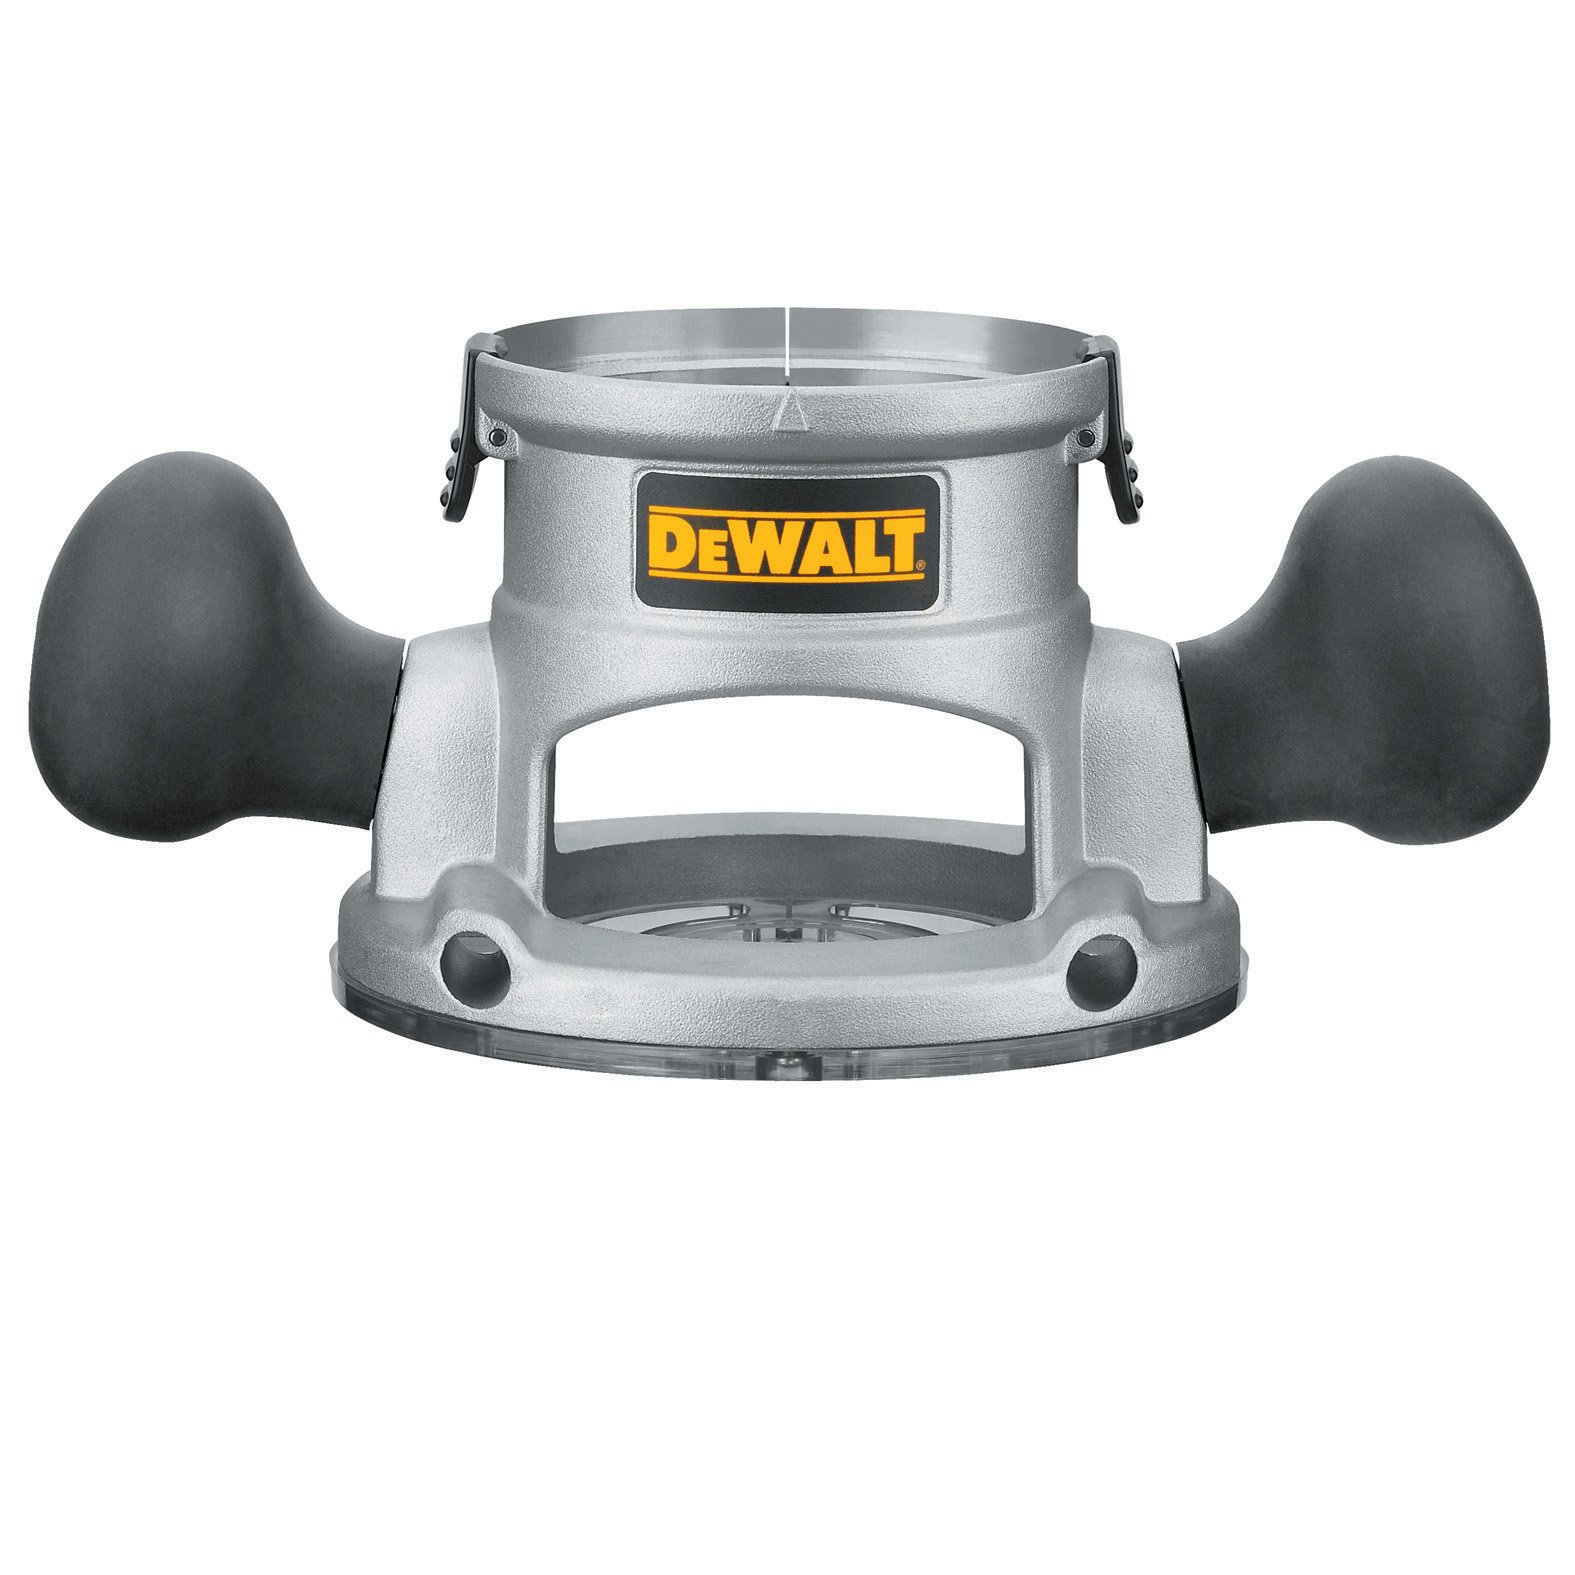 DEWALT DW6184 Fixed Base (for DW616/618 Router)